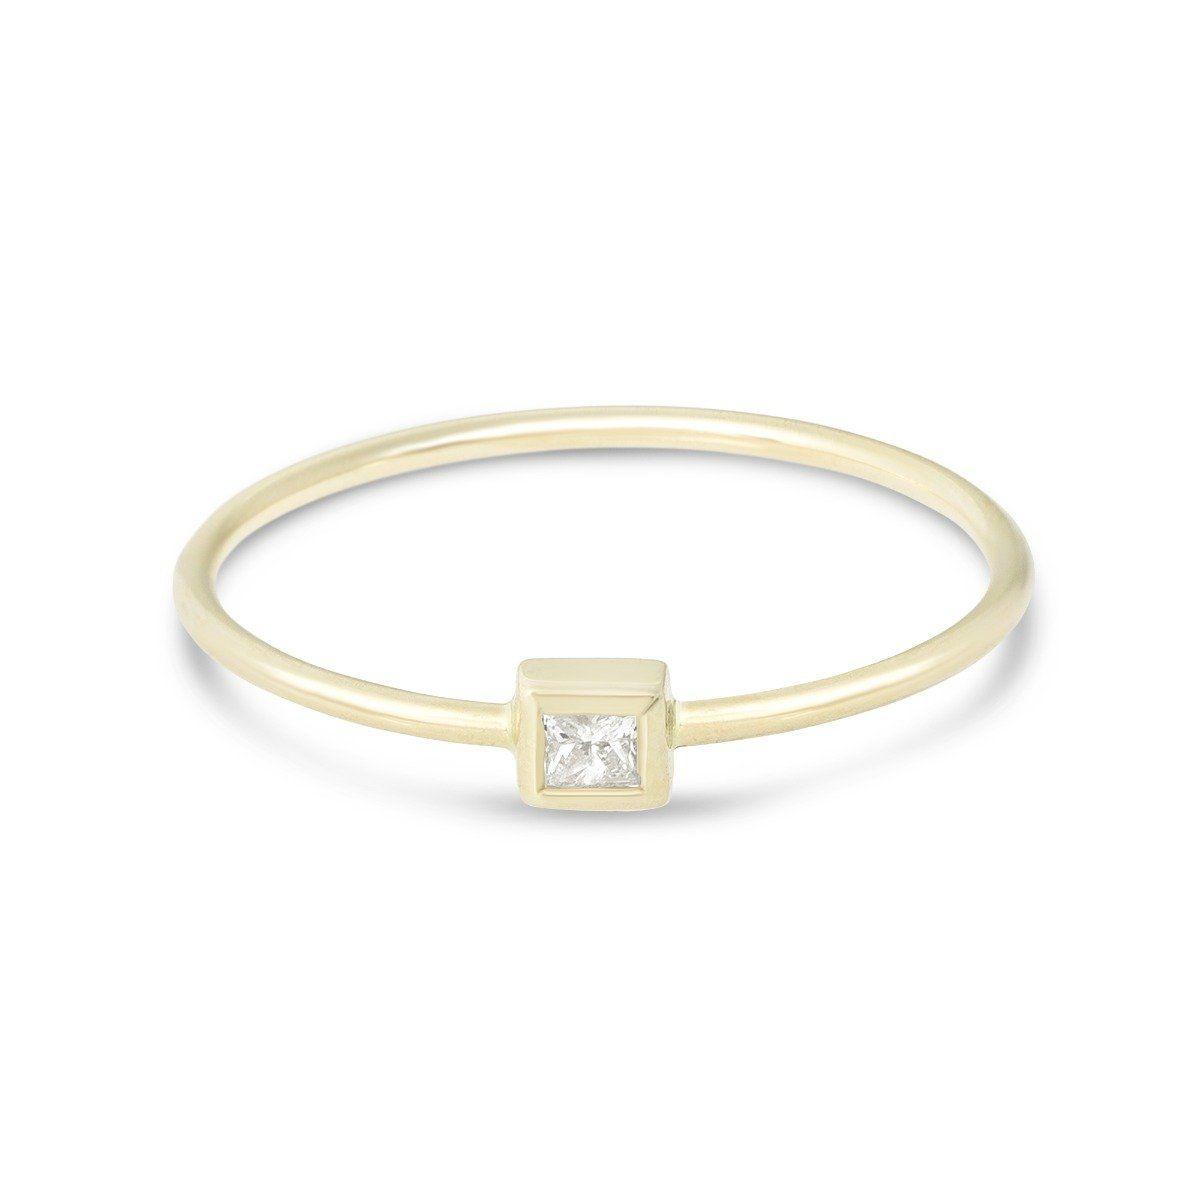 c5e6b91dd23 TIny Princess Diamond Ring - STONE AND STRAND